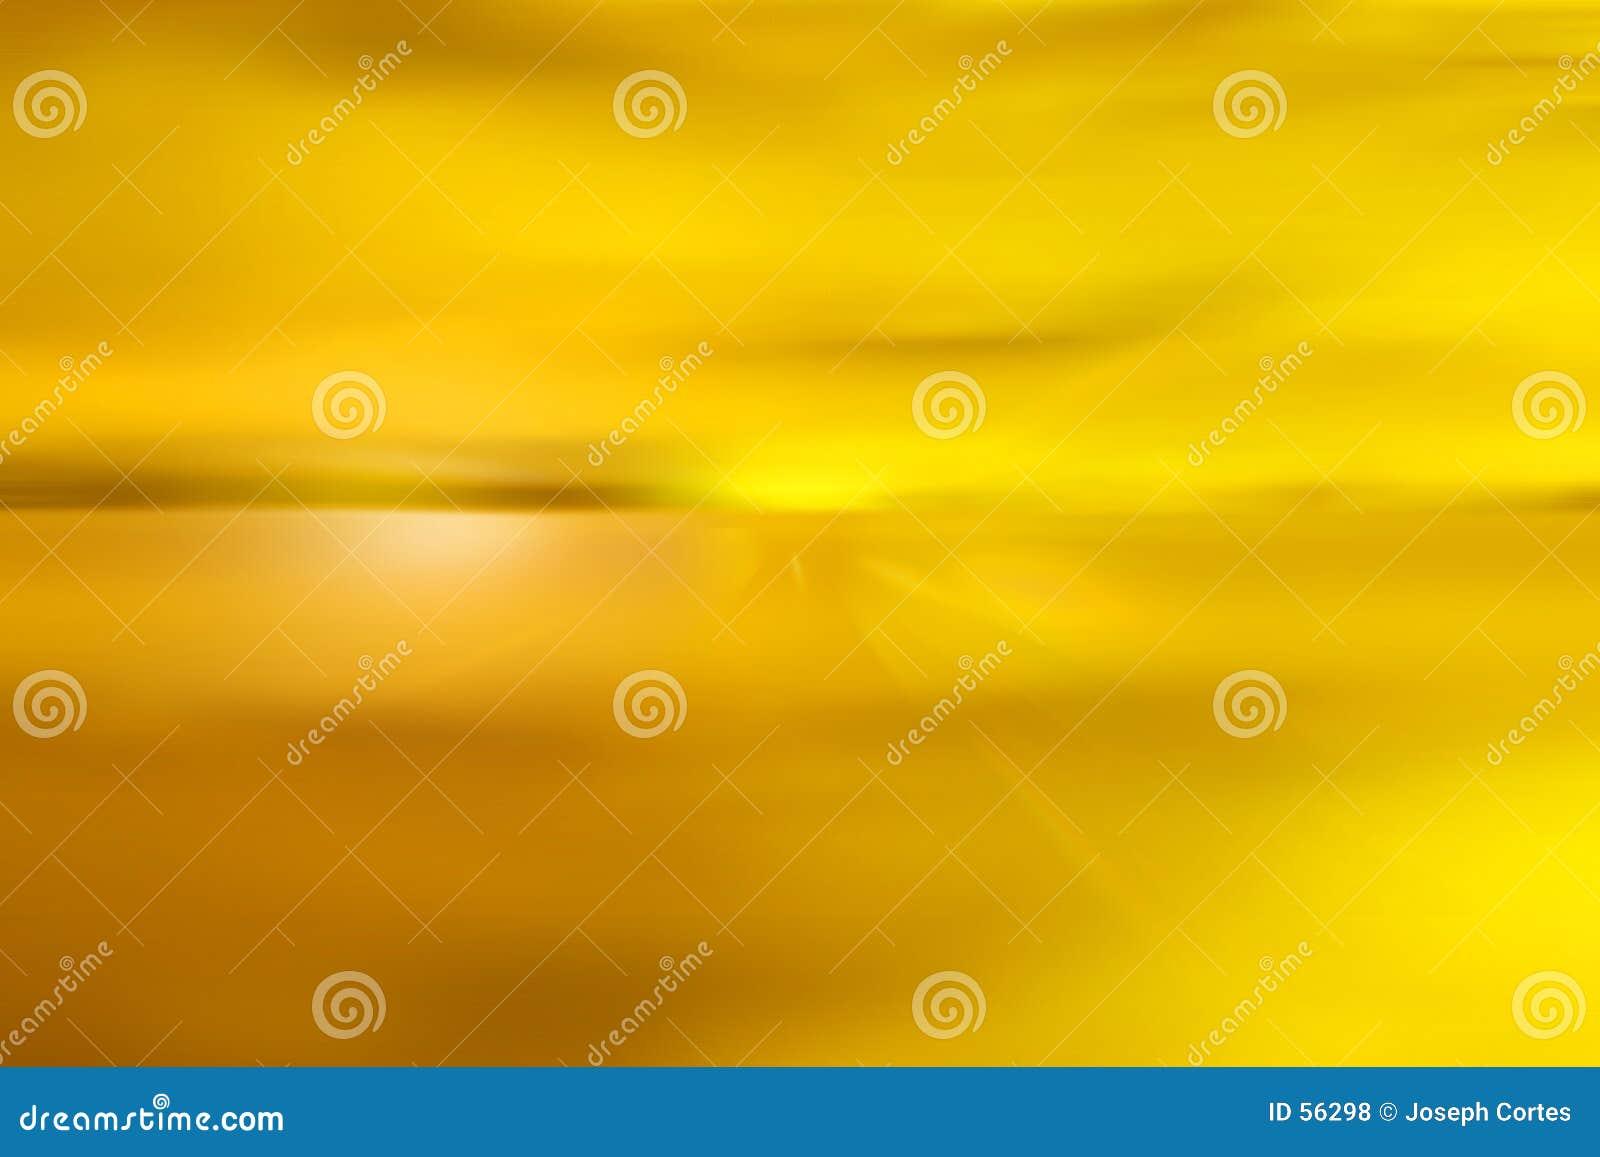 Ciel jaune abstrait